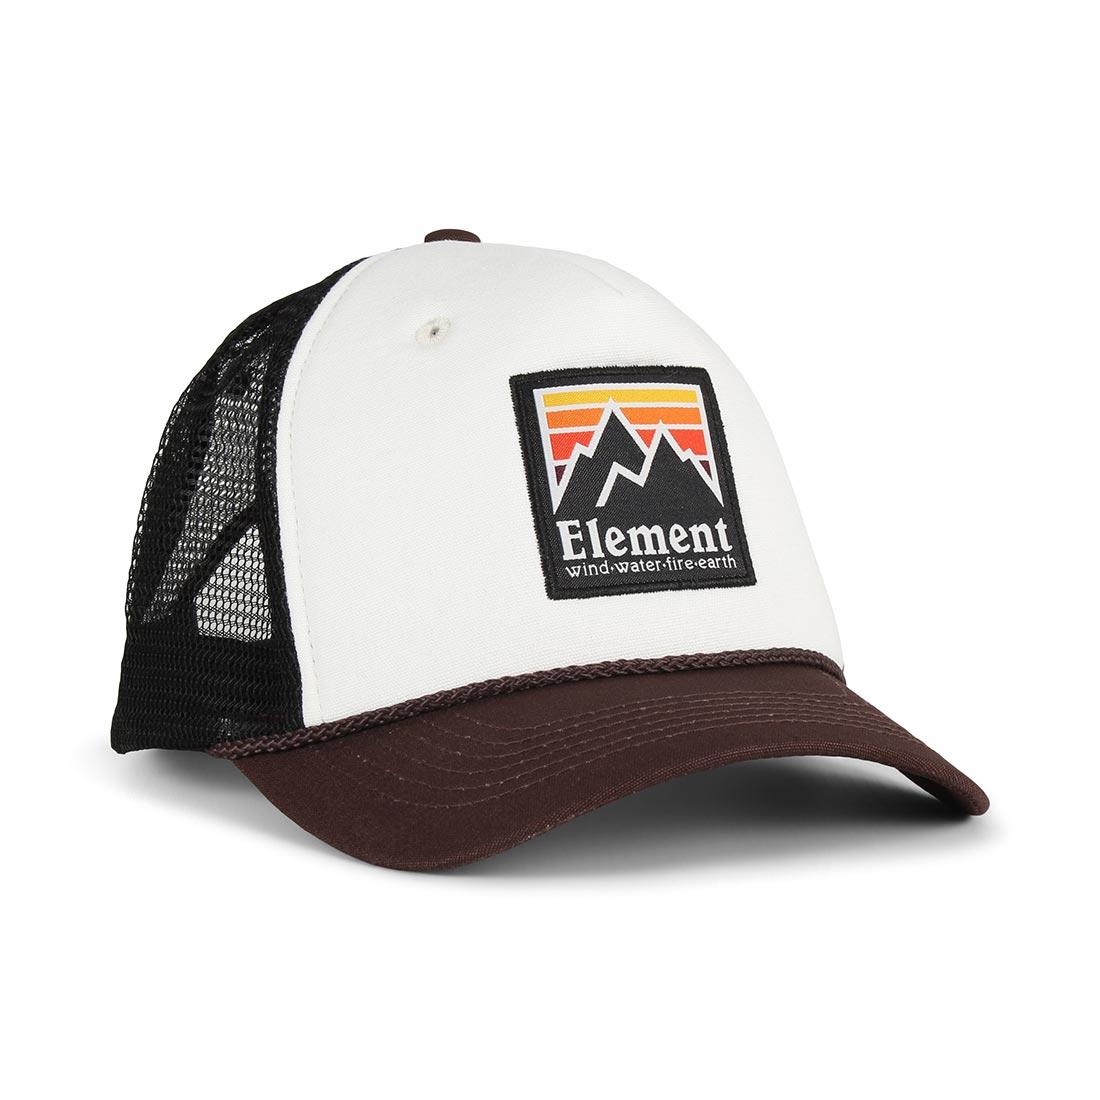 Element Peak Trucker Cap - Chocolate